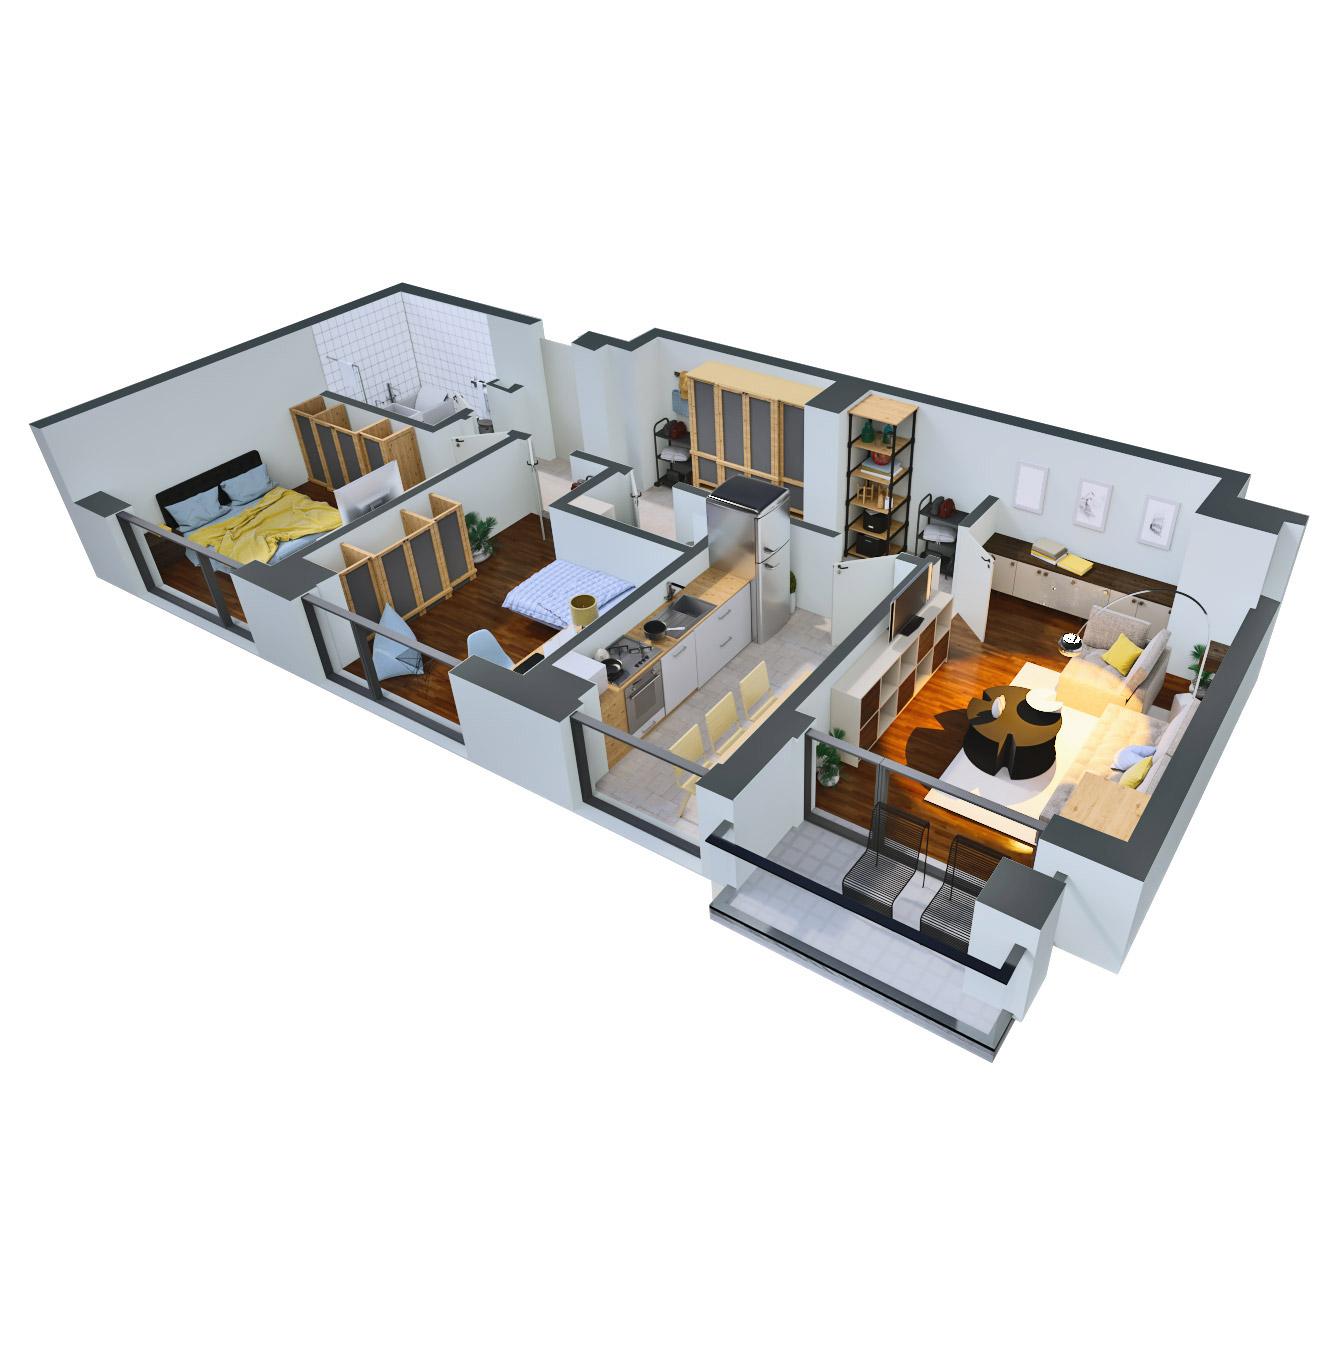 Apartament 3 camere de vanzare Bucuresti - Catedral Residence - Marriott, Piata Unirii, 13 Septembrie, Izvor - Tip 2 - T2A - B